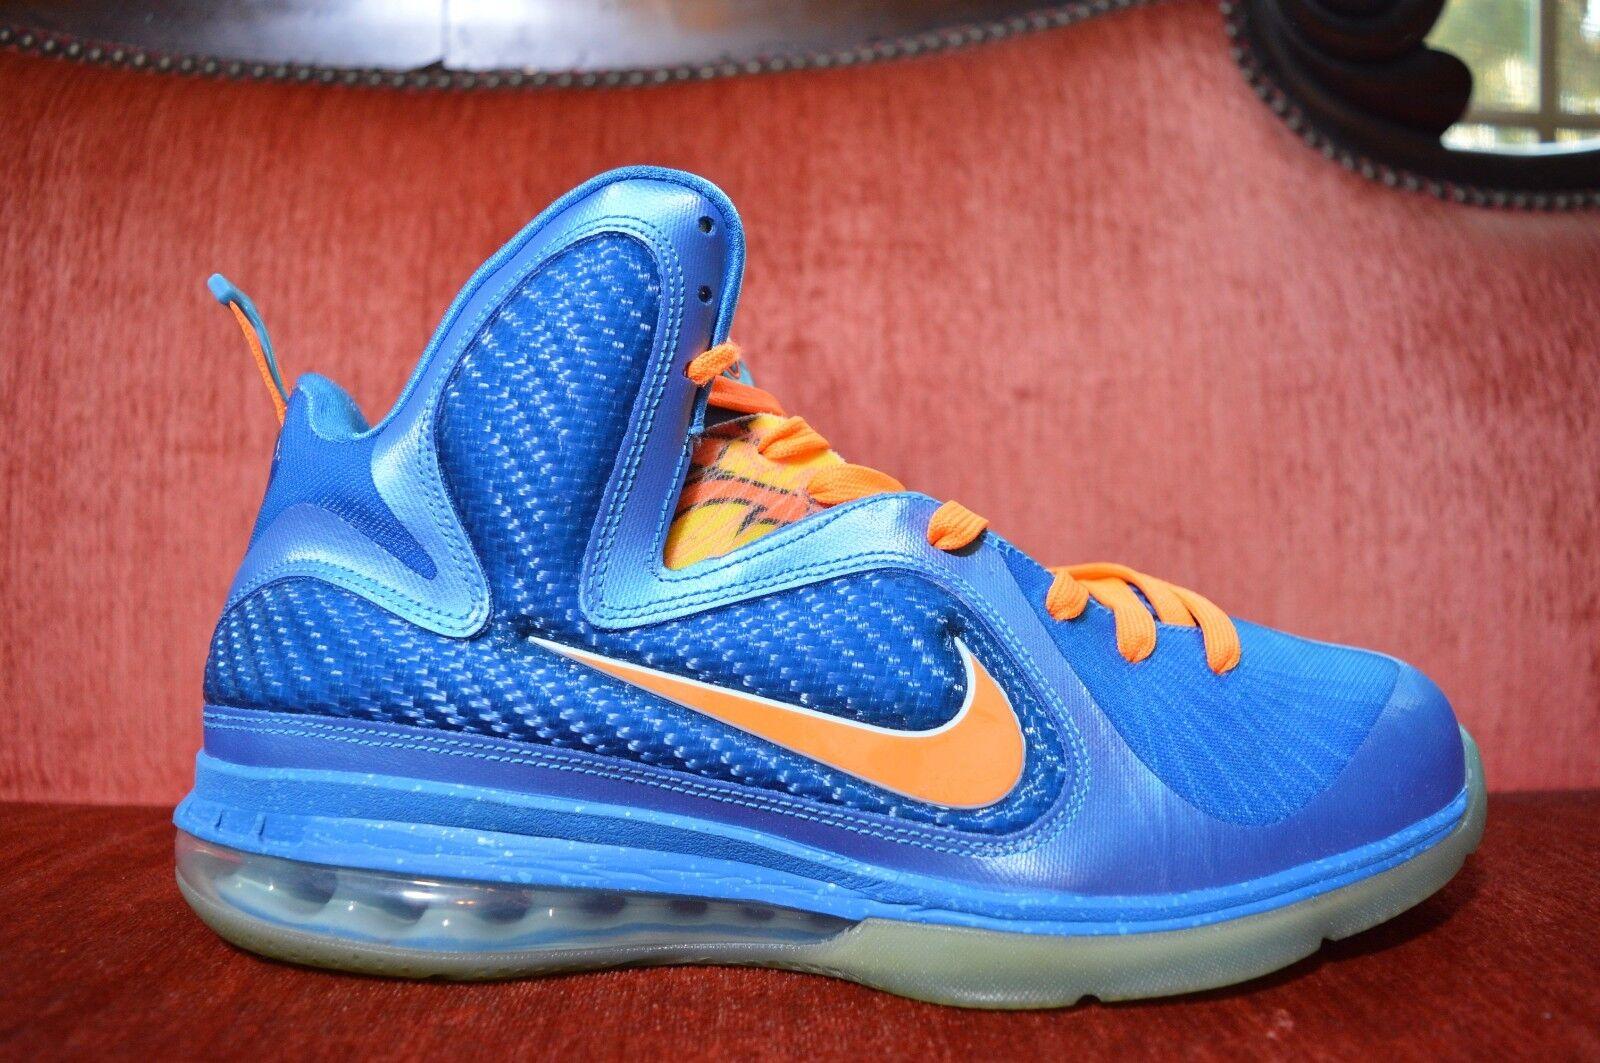 Clean Nike Lebron 9 IX China US Men Size 11 469764 800 Blue Orange OG ALL